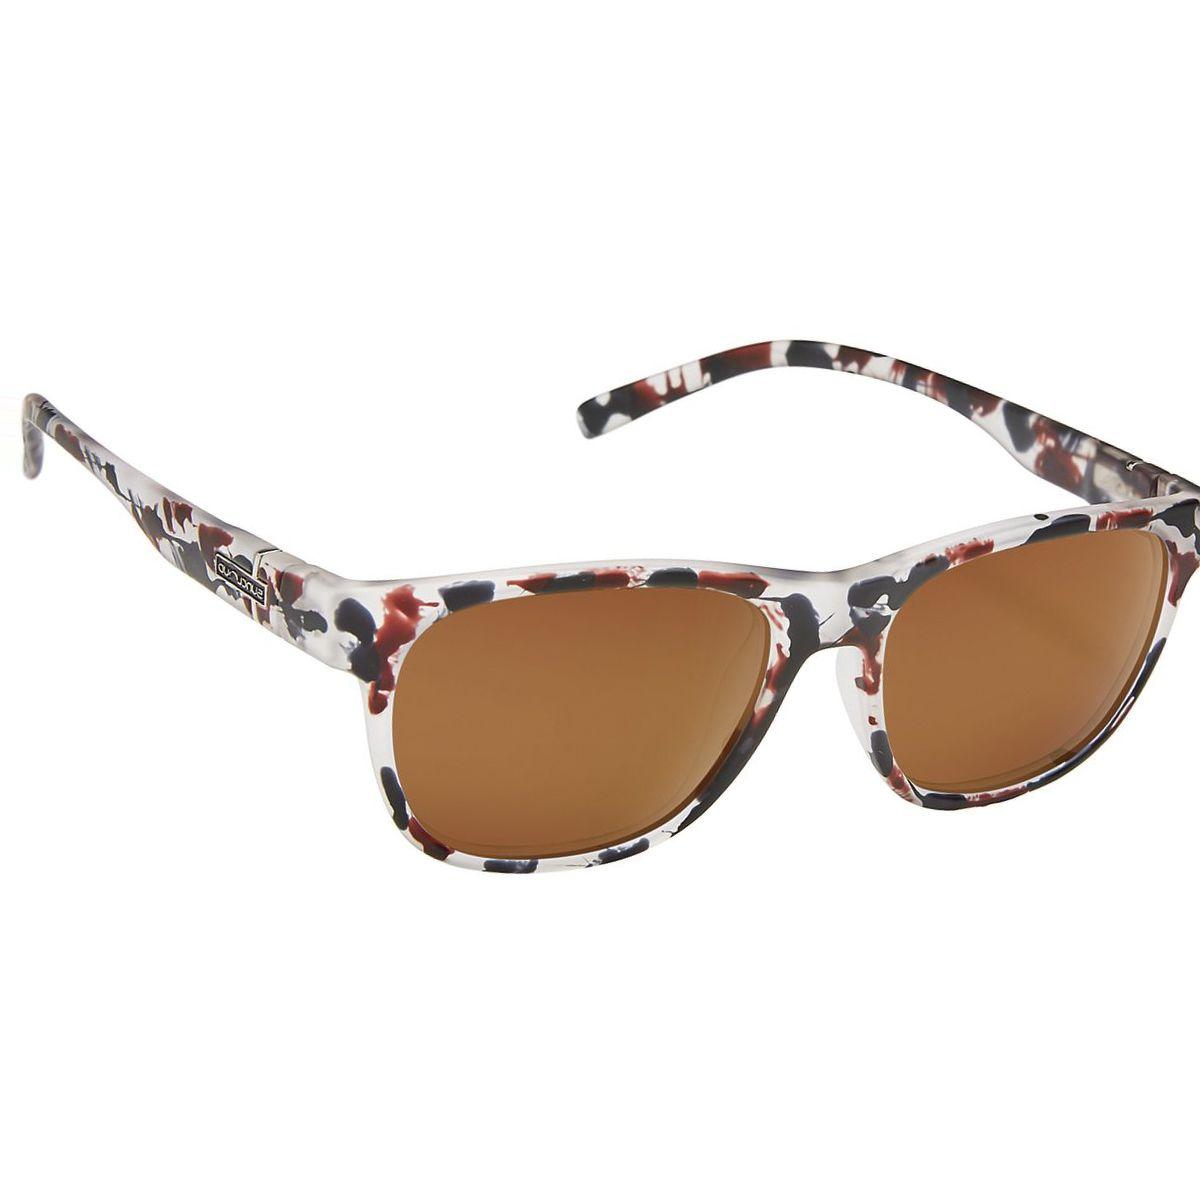 Suncloud Polarized Optics Scene Polarized Sunglasses - Women's